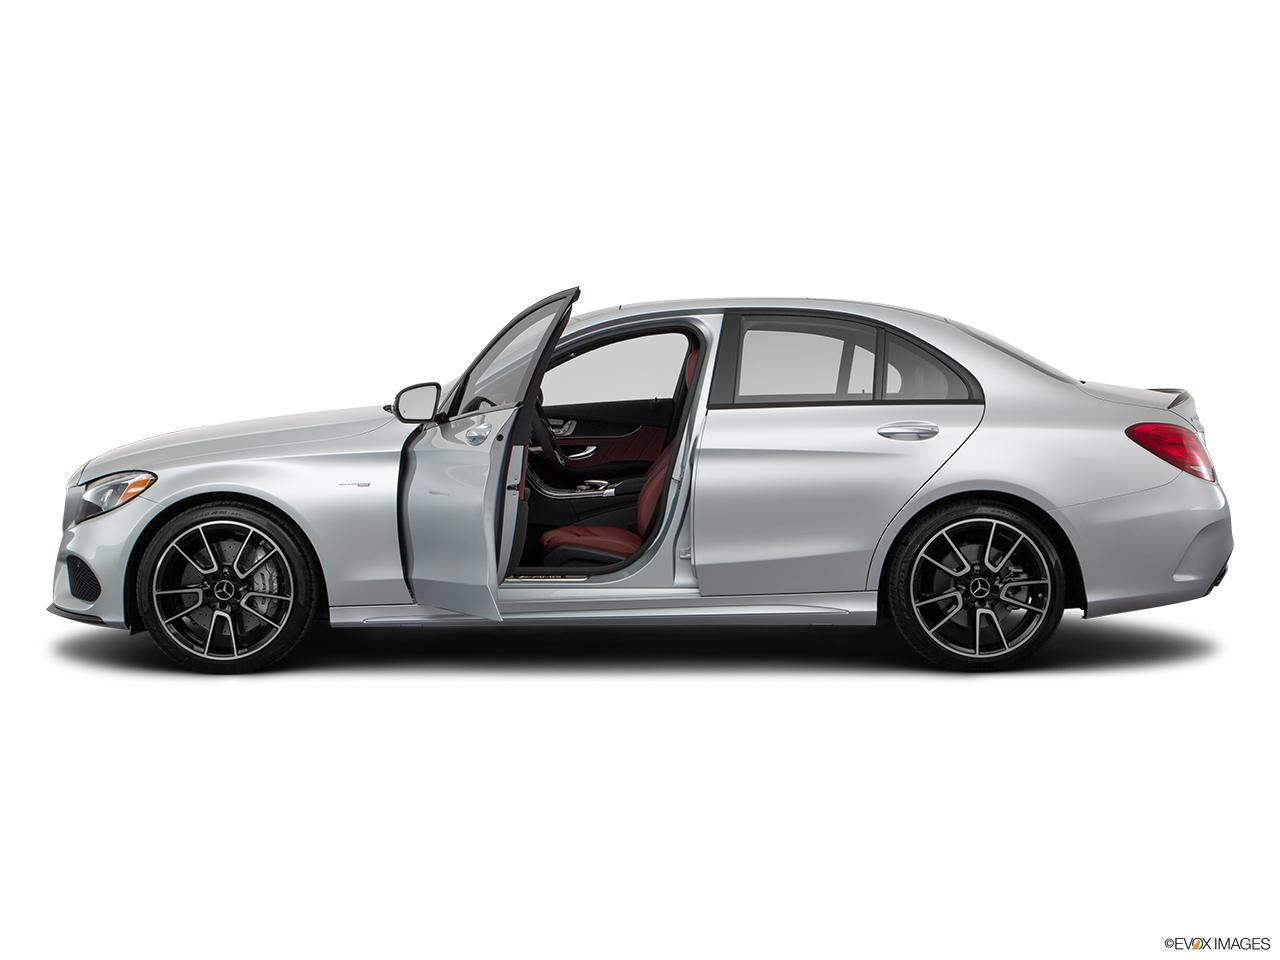 Mercedes Benz C Class 2018 C 43 AMG 4MATIC in UAE New Car Prices